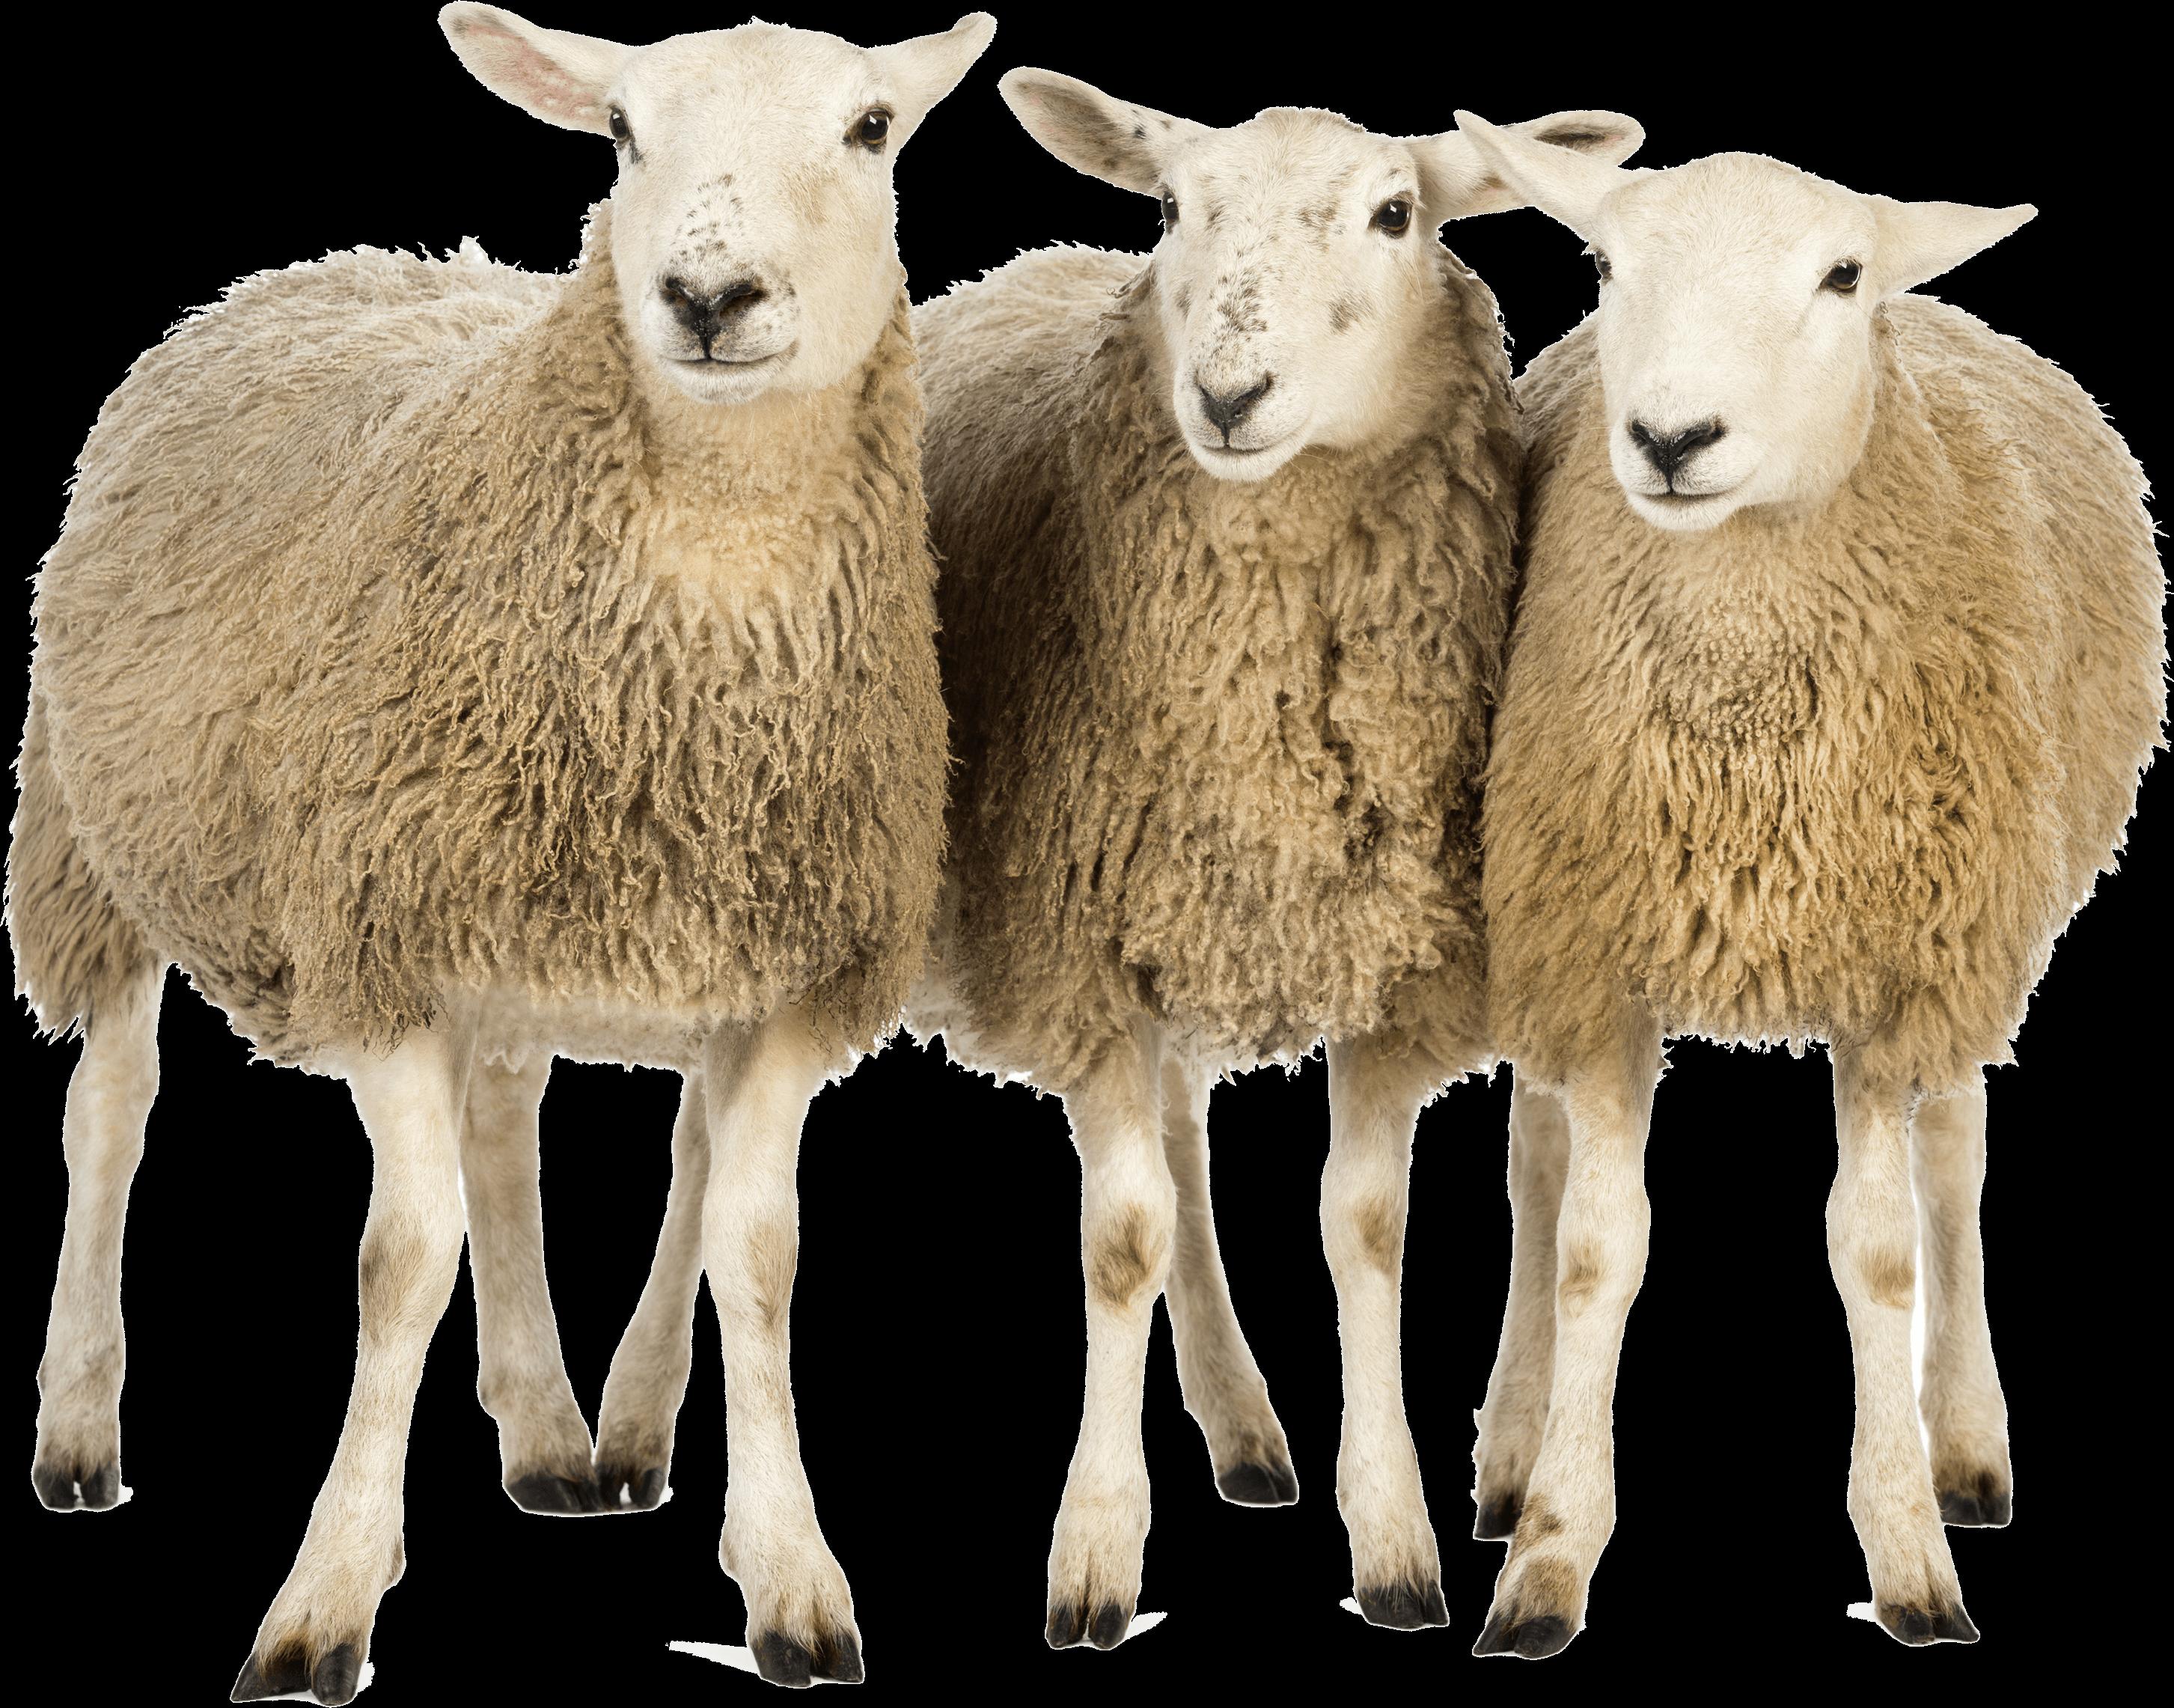 Sheep PNG Download Image SVG Clip arts